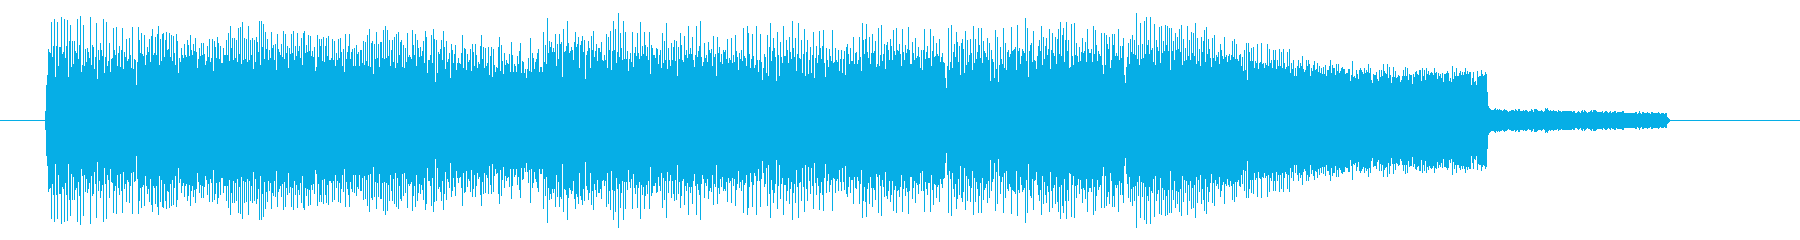 NES レース A05-1(クリア1)の再生済みの波形